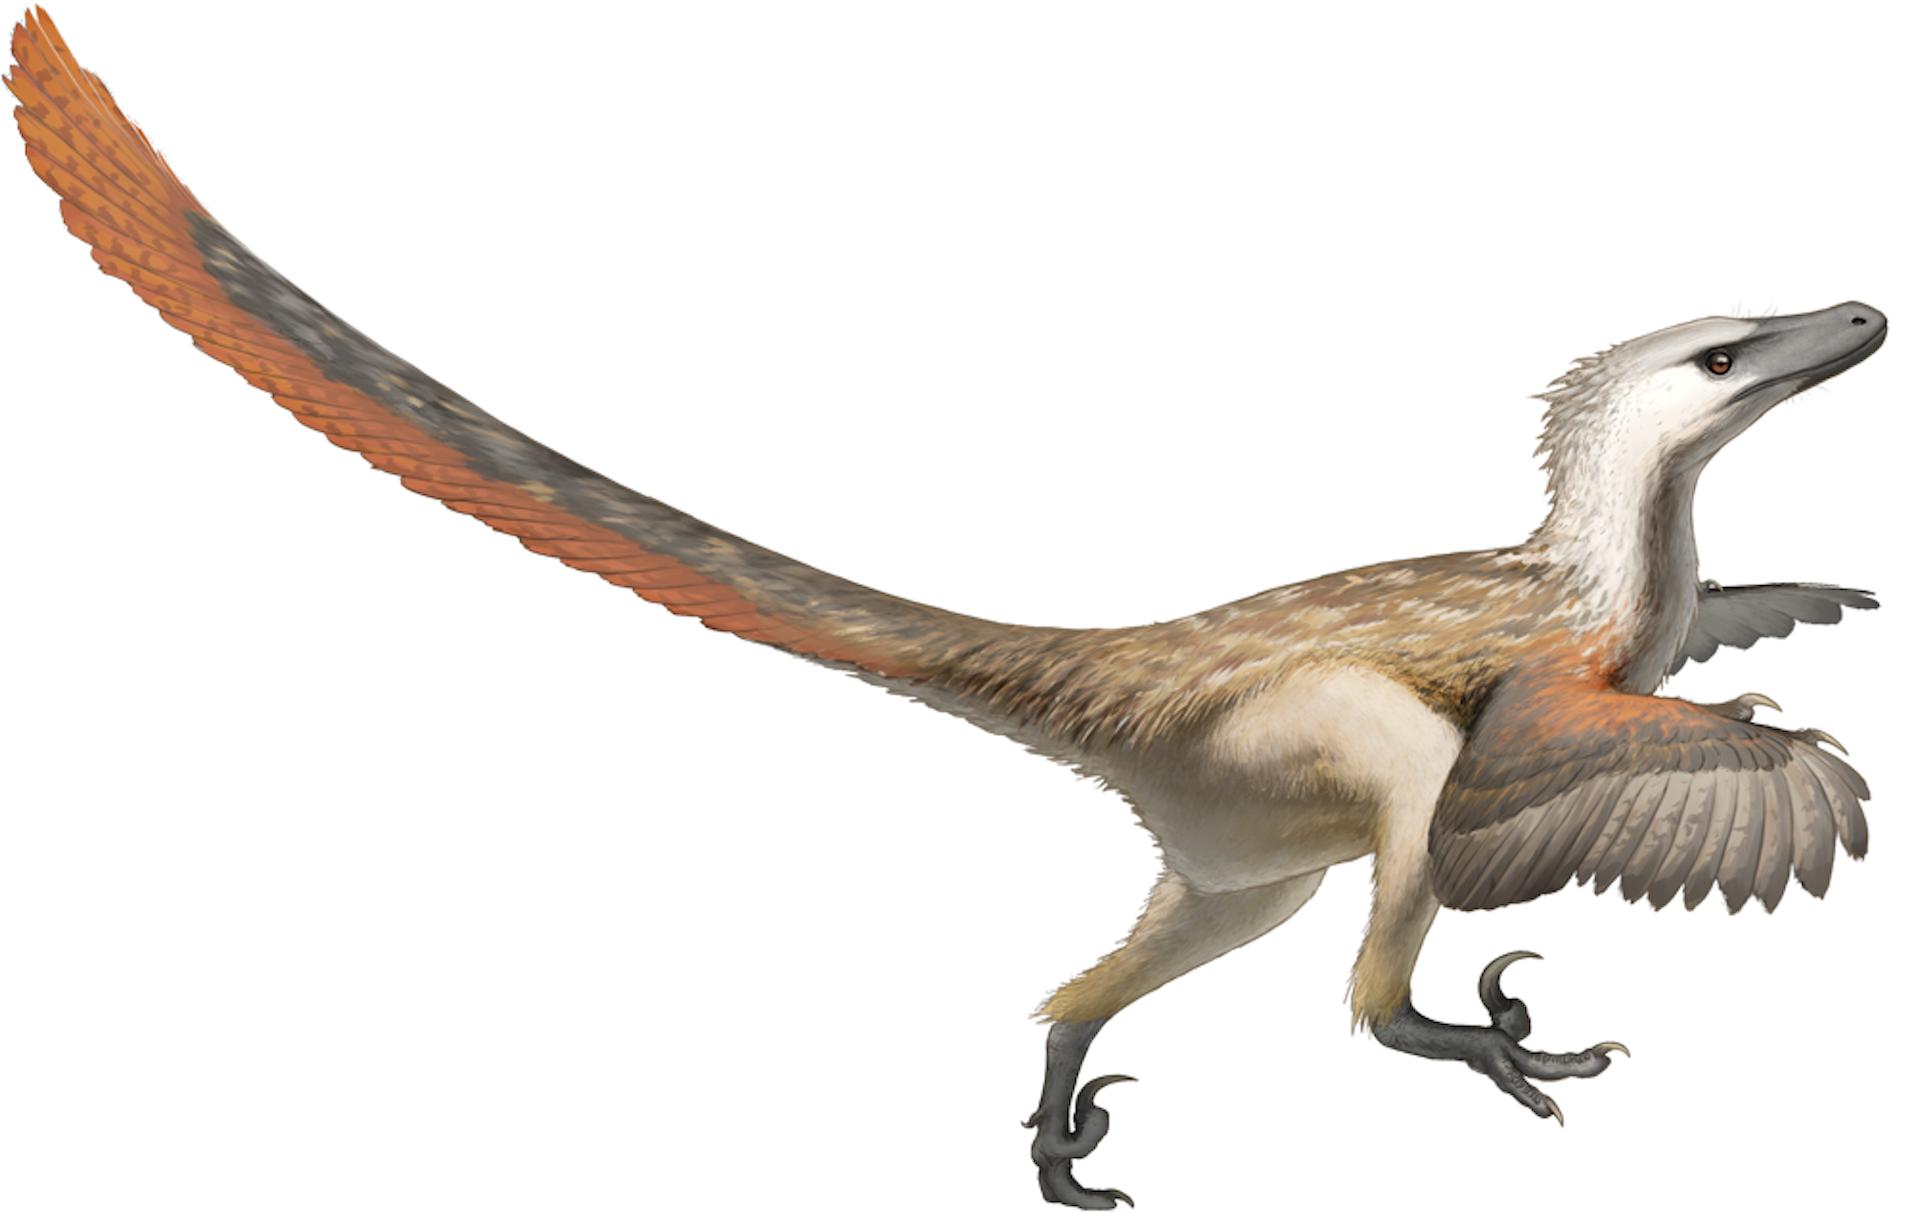 Jurassic Park - A Velociraptor